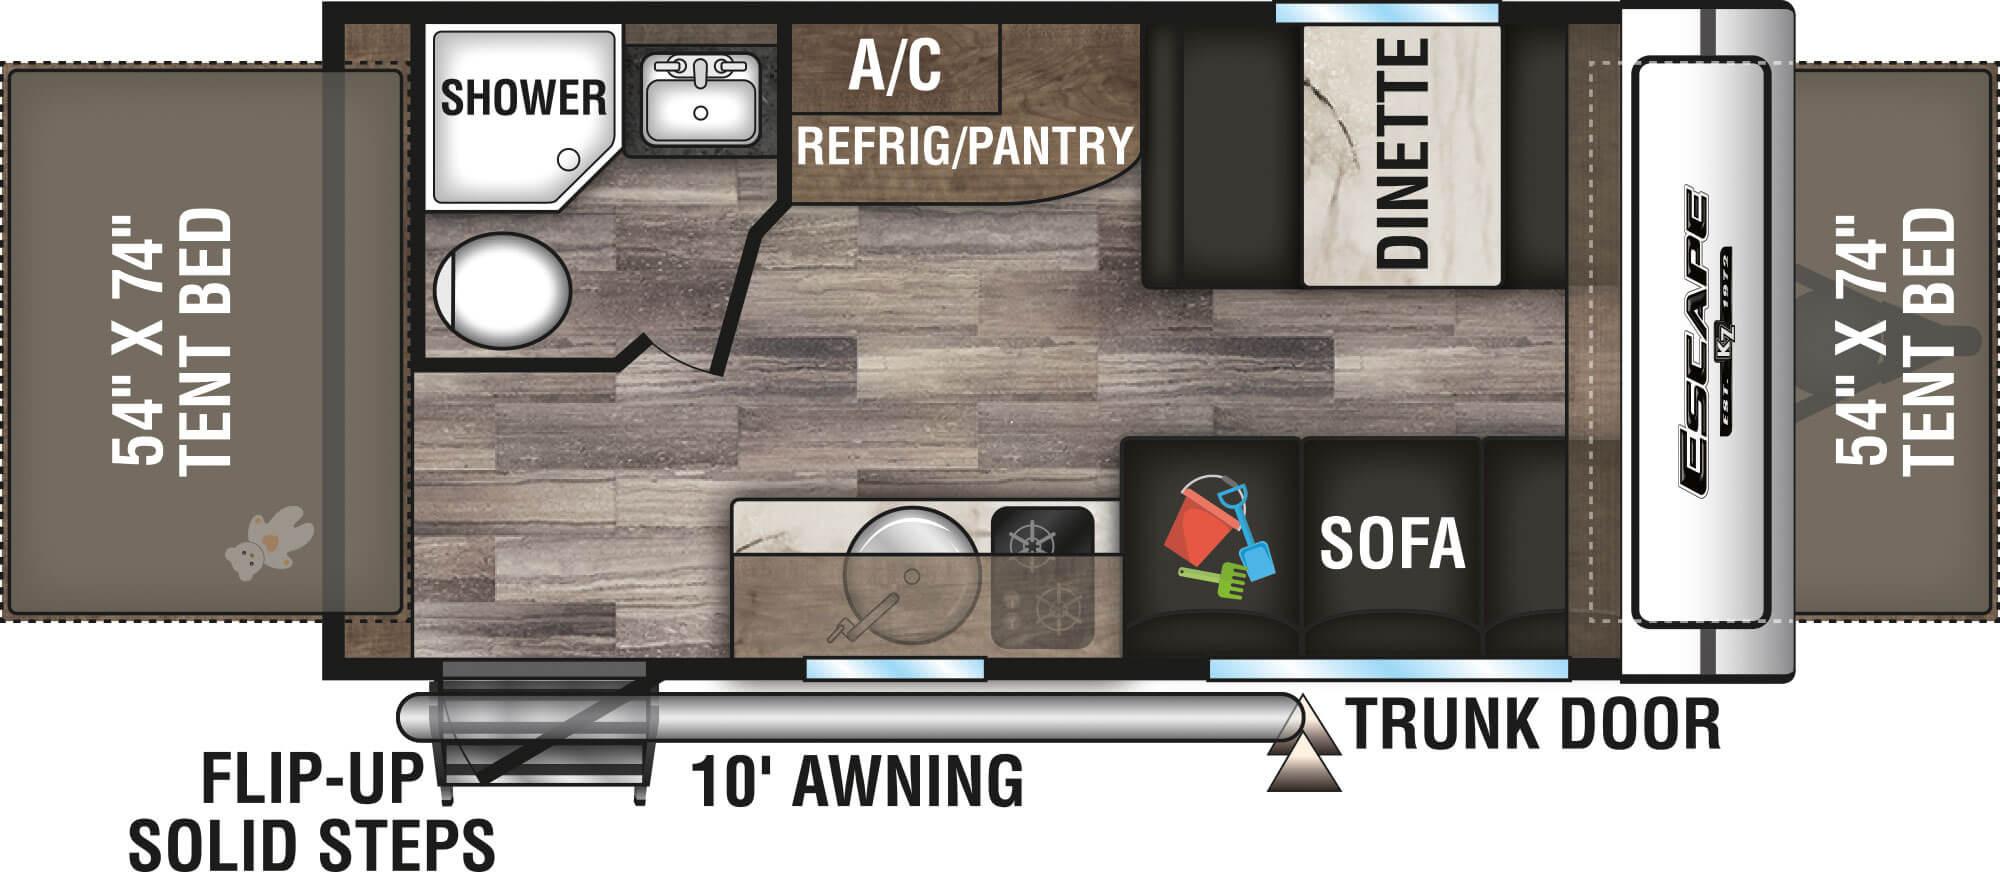 View Floor Plan for 2021 K-Z RV ESCAPE 160RBT